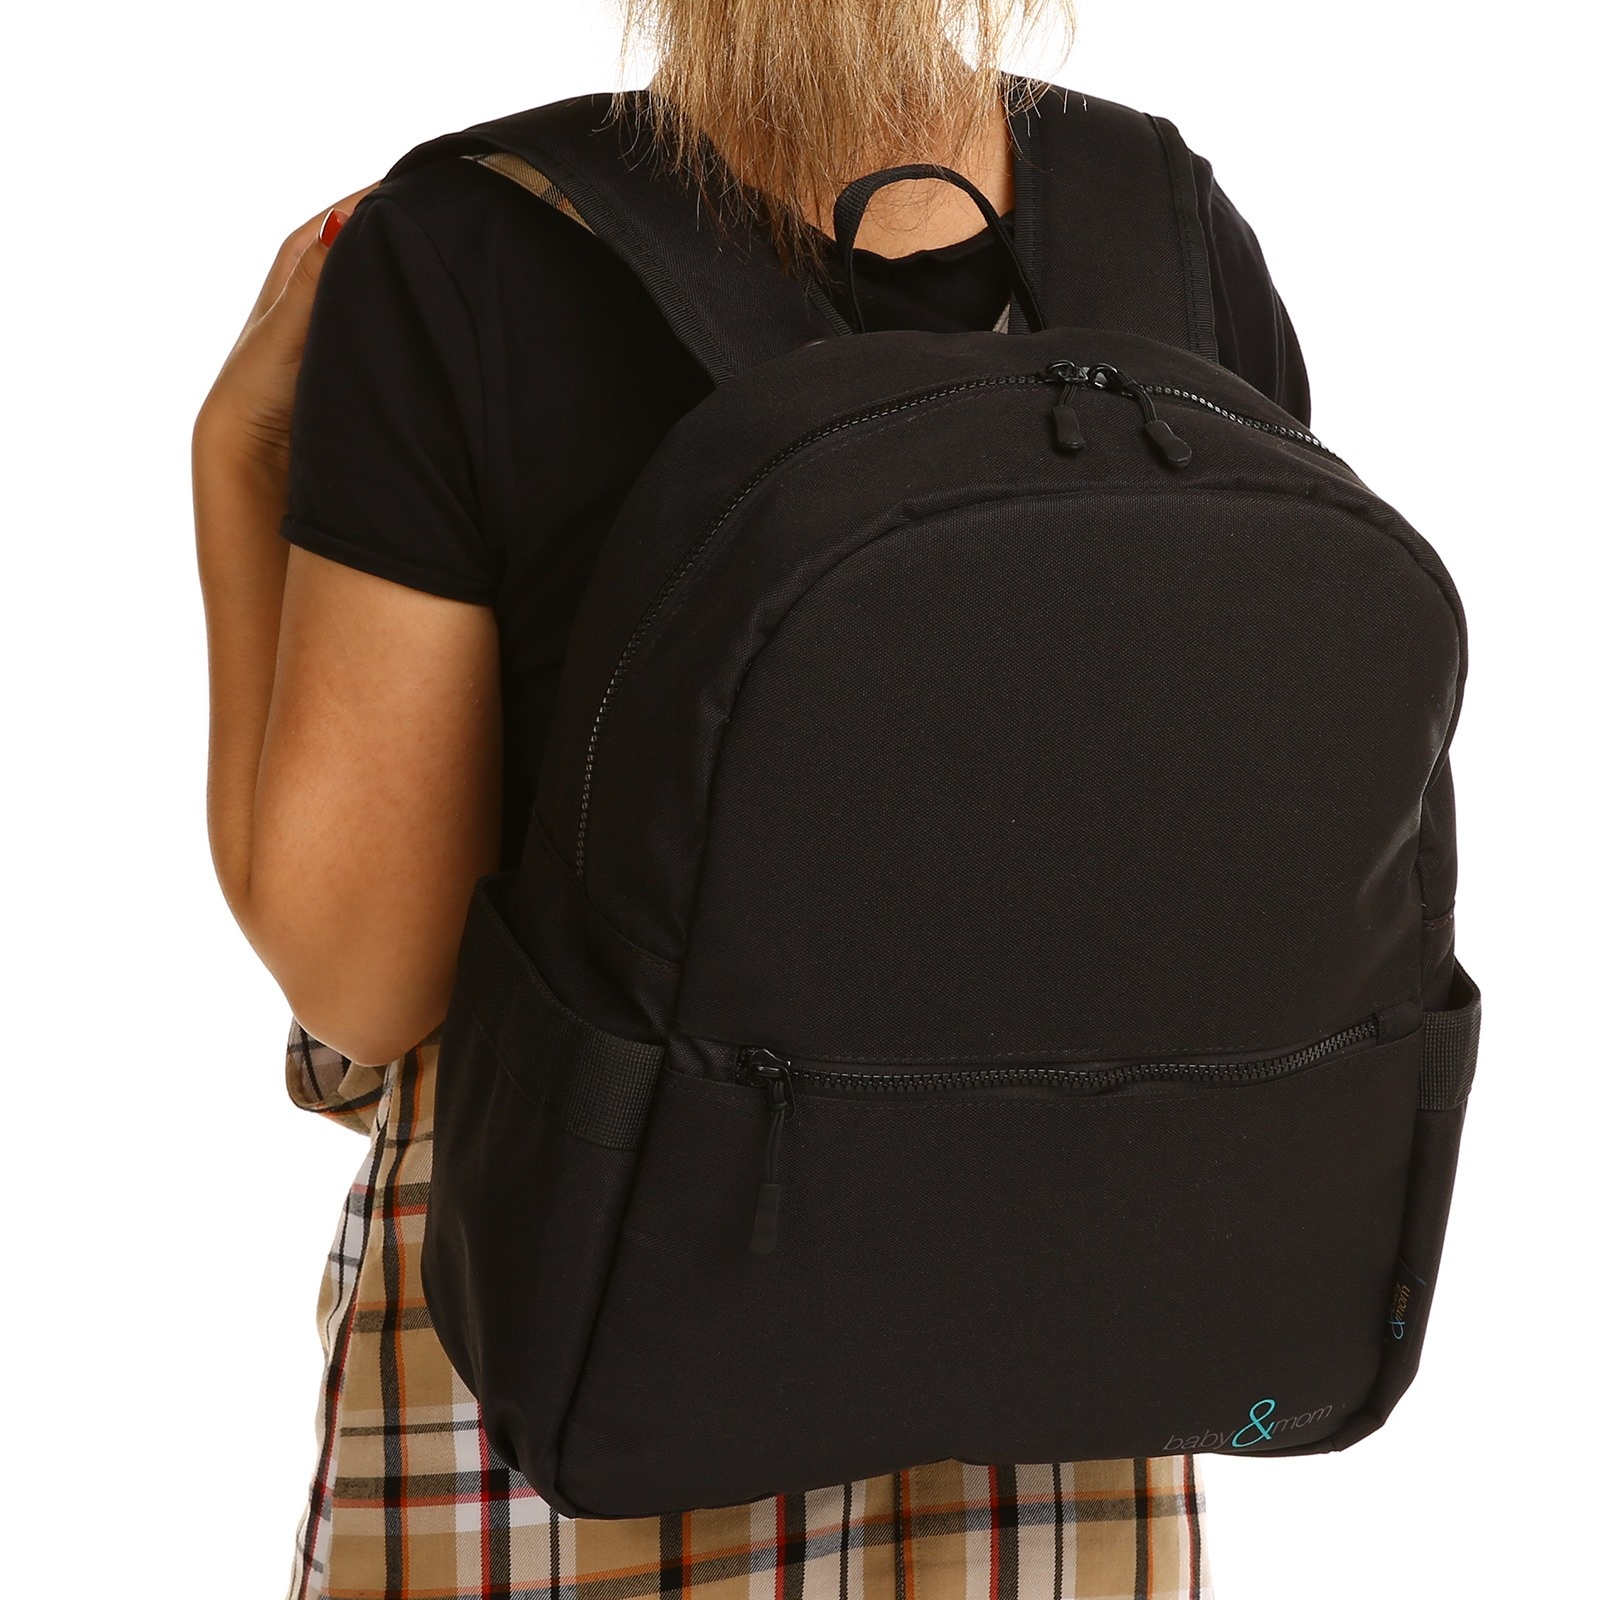 Ebebek Babymom Baby&Mom Multipurpose Comfort Backpack Bag